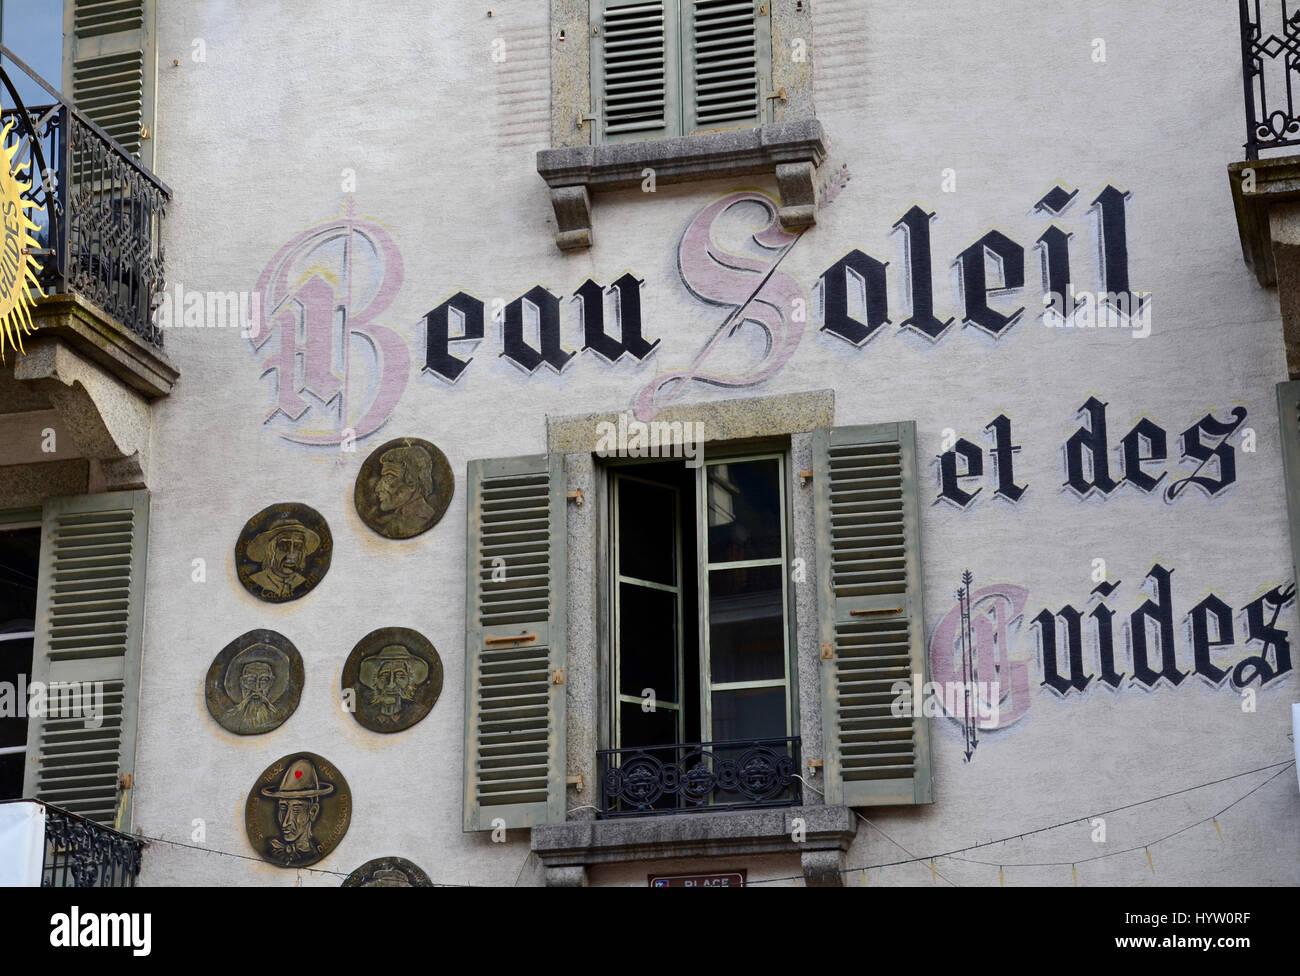 French advertising on building in Geneva, Switzerland (Translation: Beautiful Sun) - Stock Image